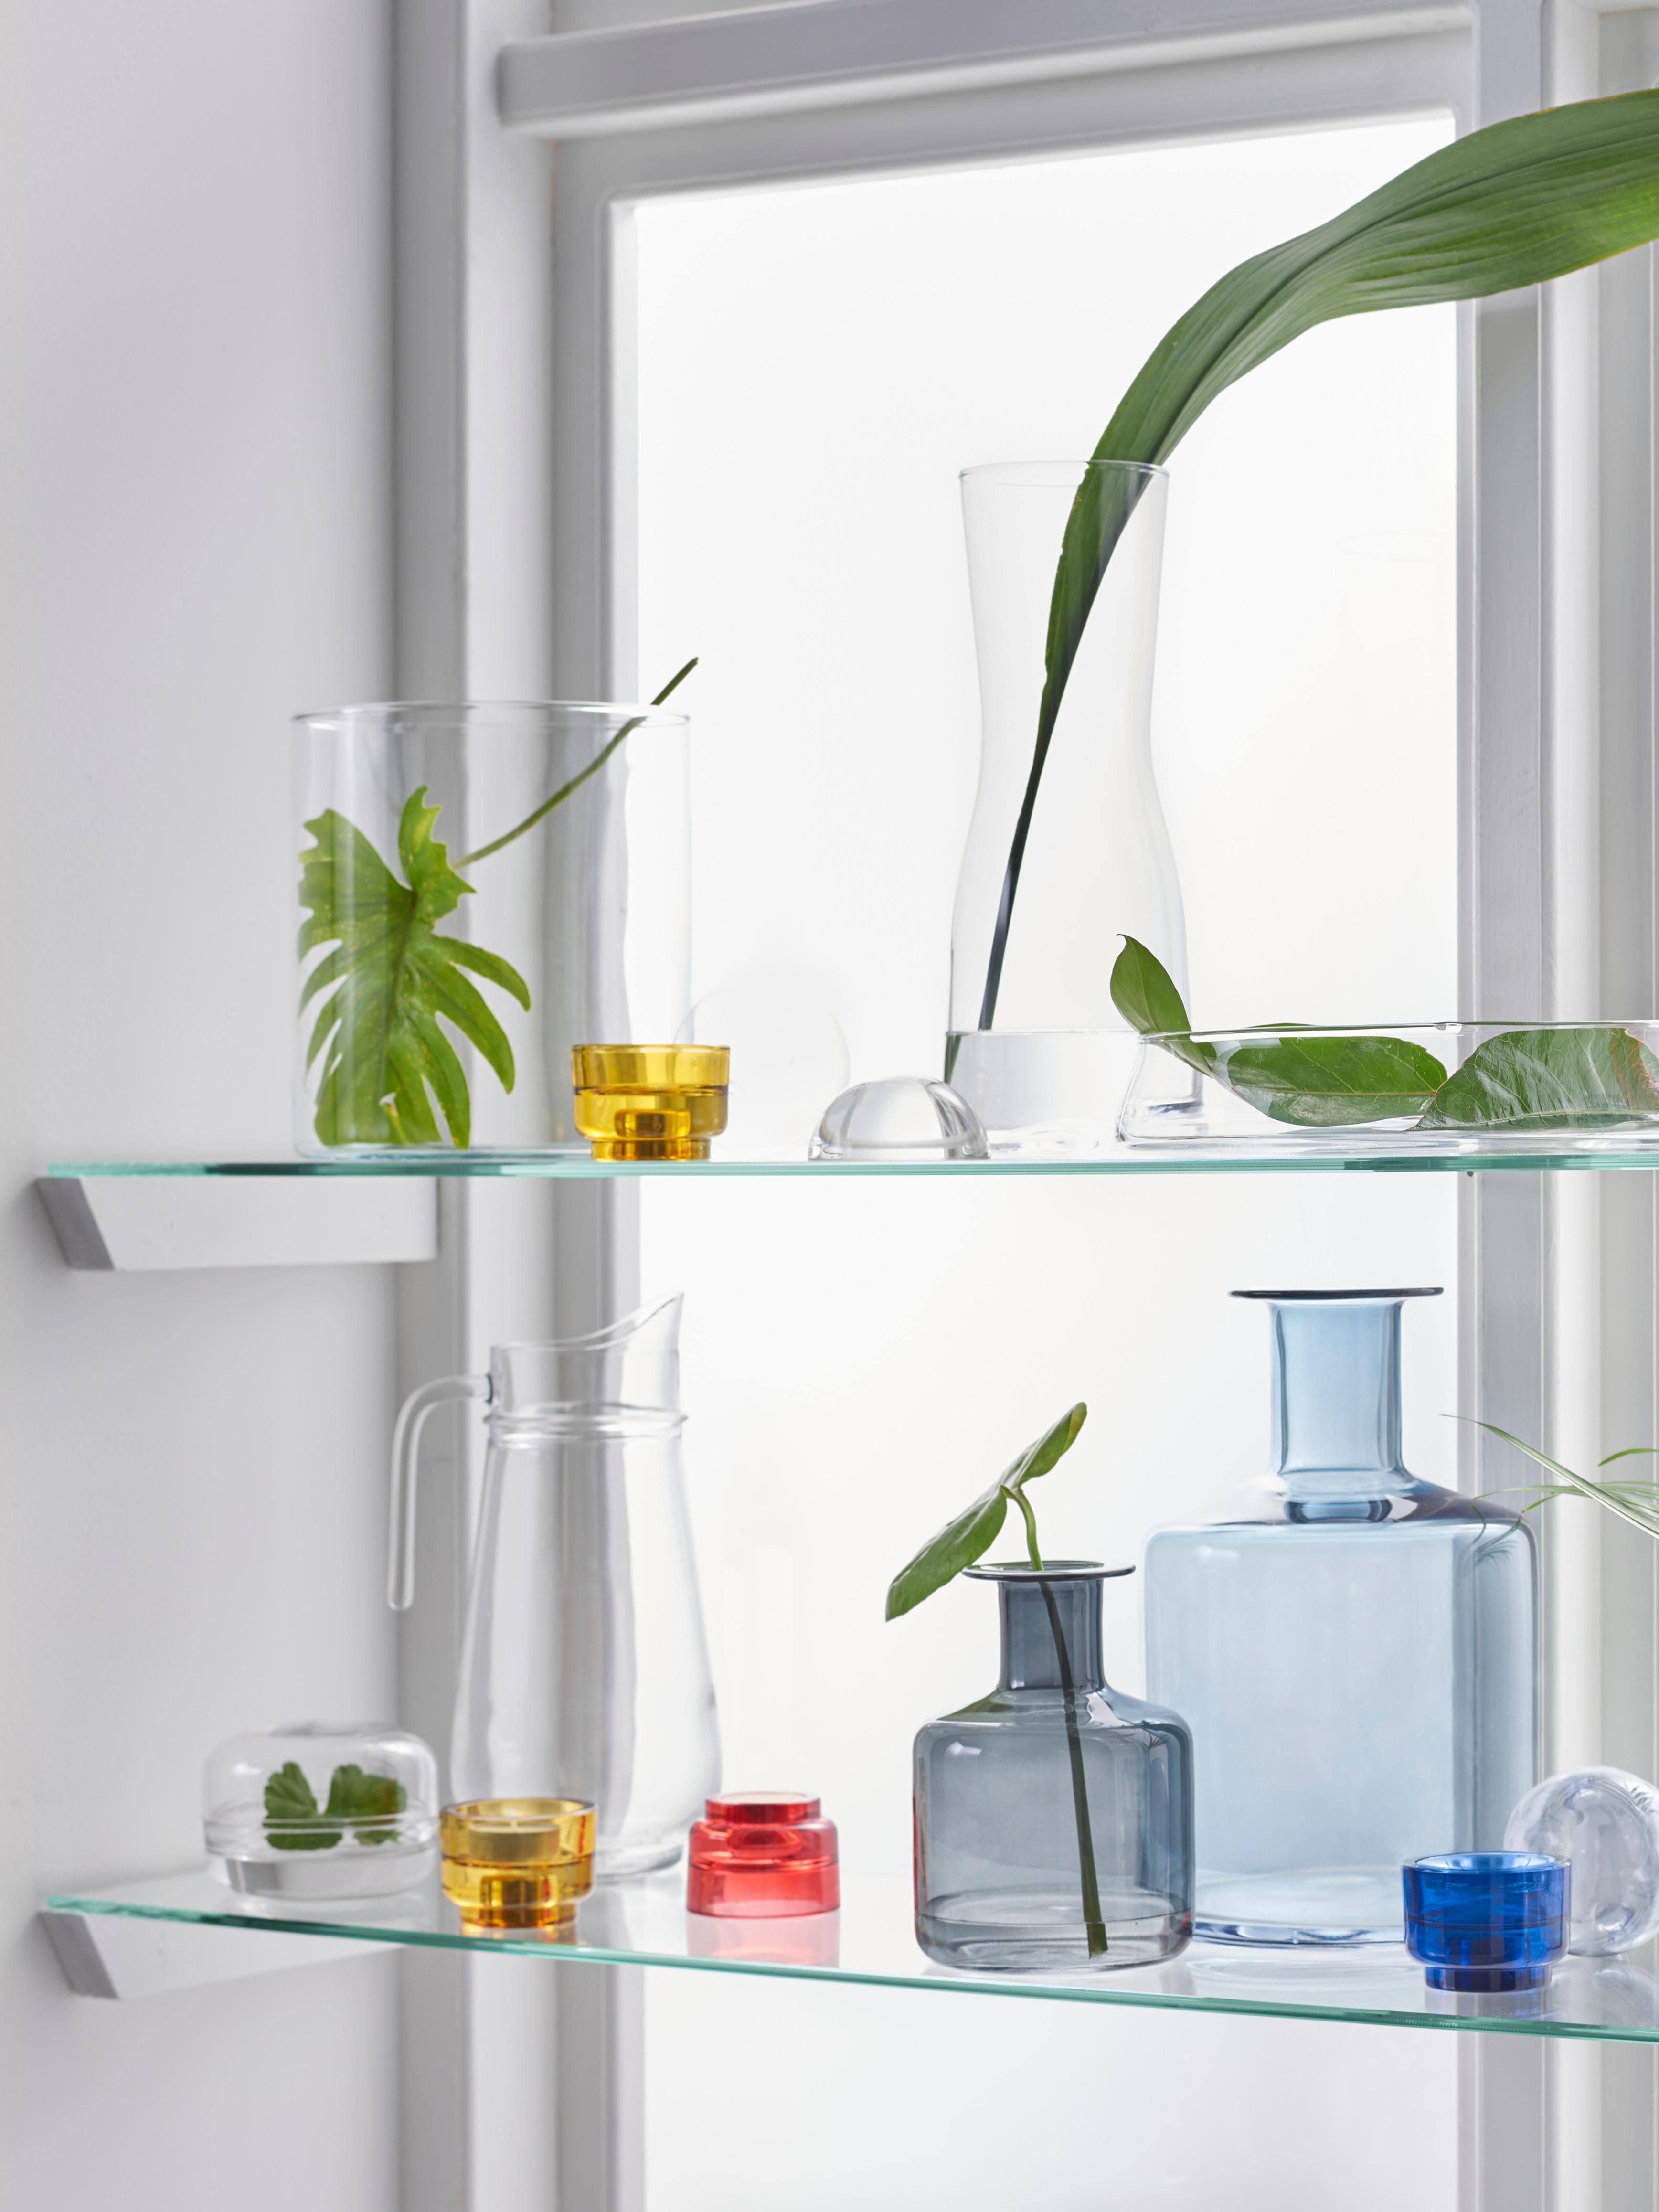 Siva PEPPARKORN staklena vaza od puhanog stakla na sunčanom prozoru pokraj TILLBRINGARE vrča te CYLINDER i TIDVATTEN staklenih vaza.